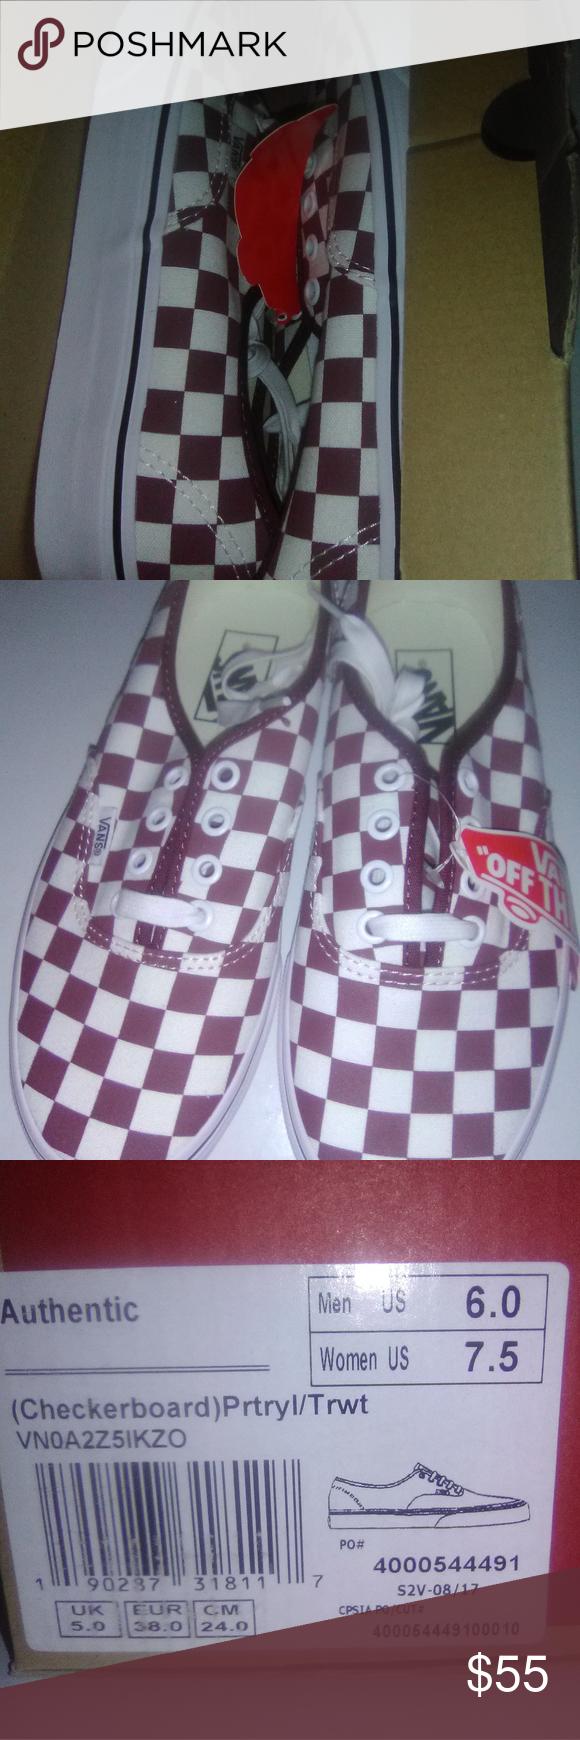 burgundy and white checkerboard vans